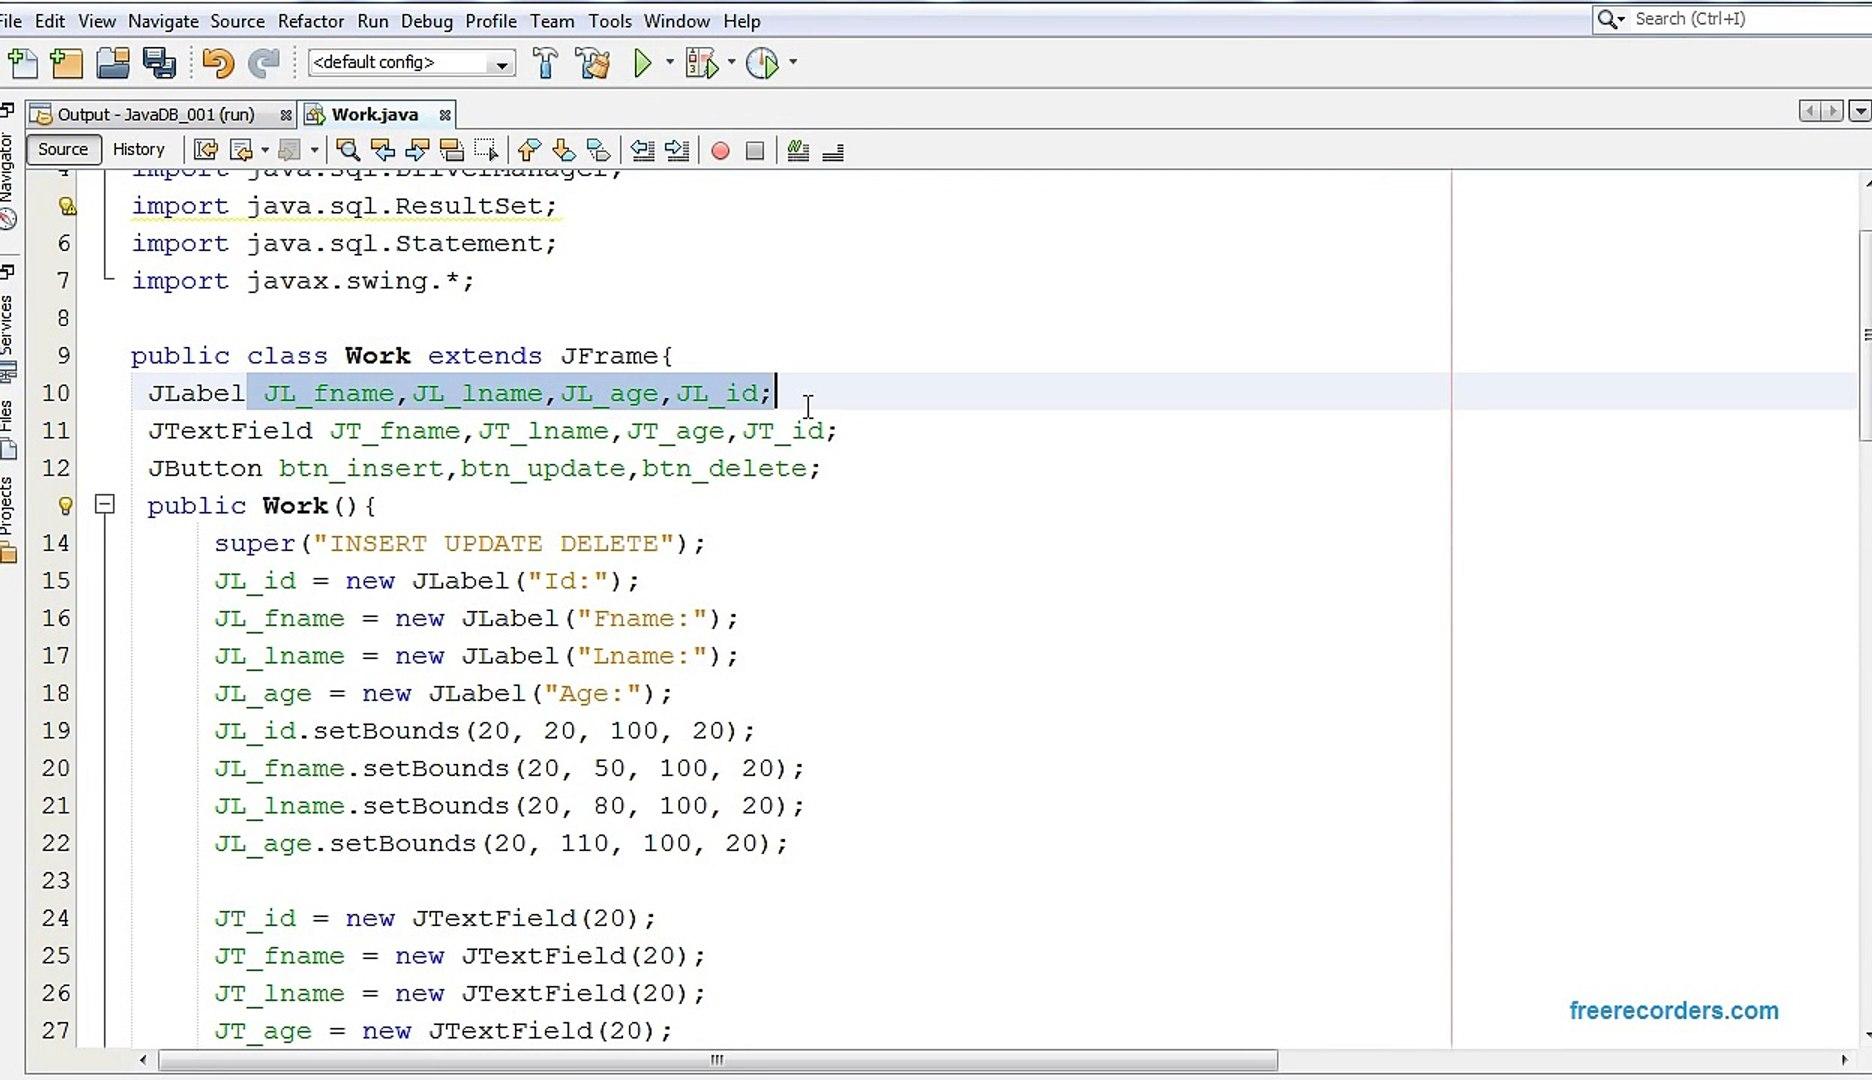 JAVA & MySQL - How To Insert Update Delete Data In MySQL Database Using Java [ with source code